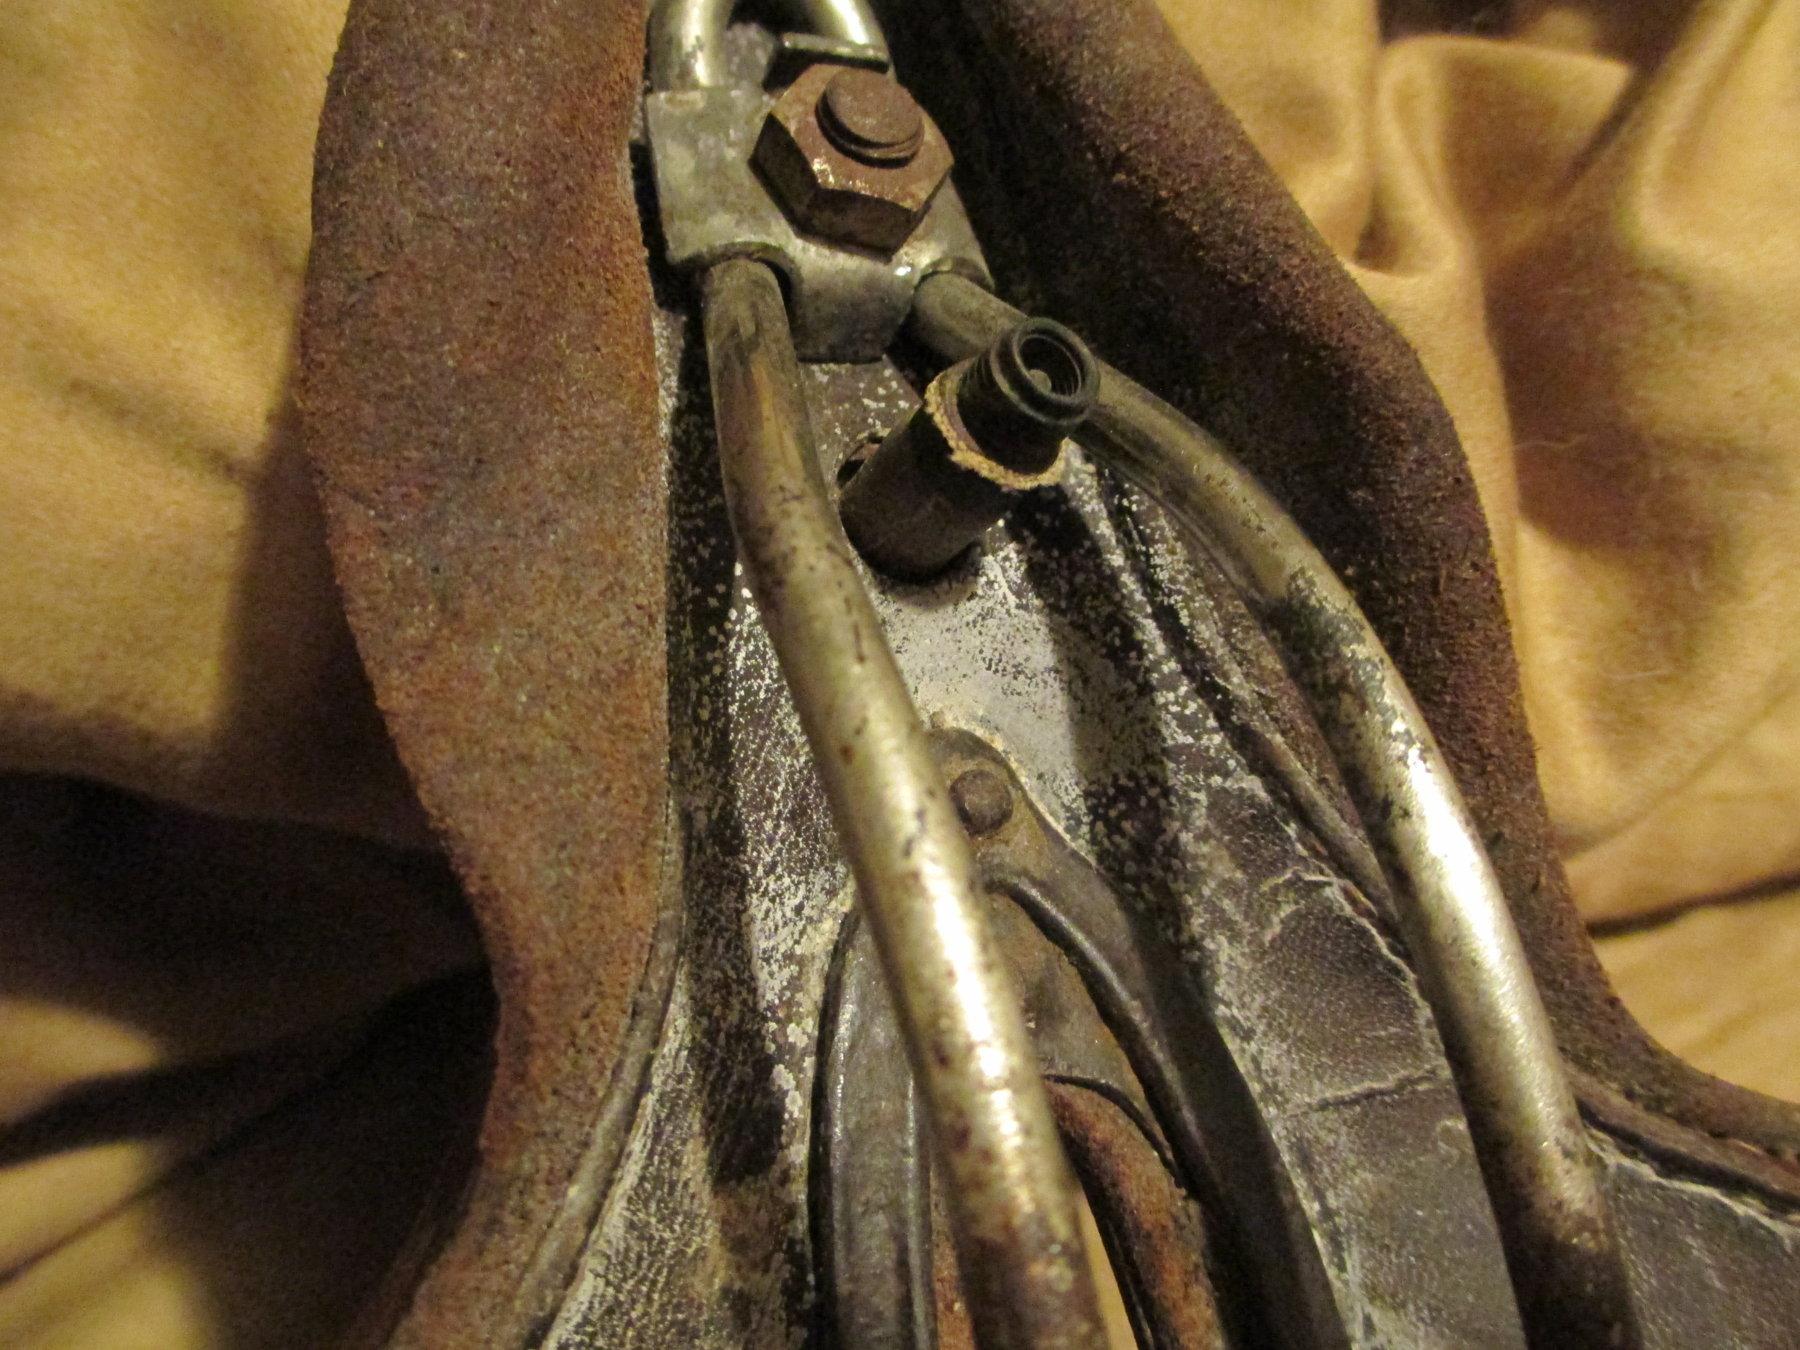 saddle 002.JPG